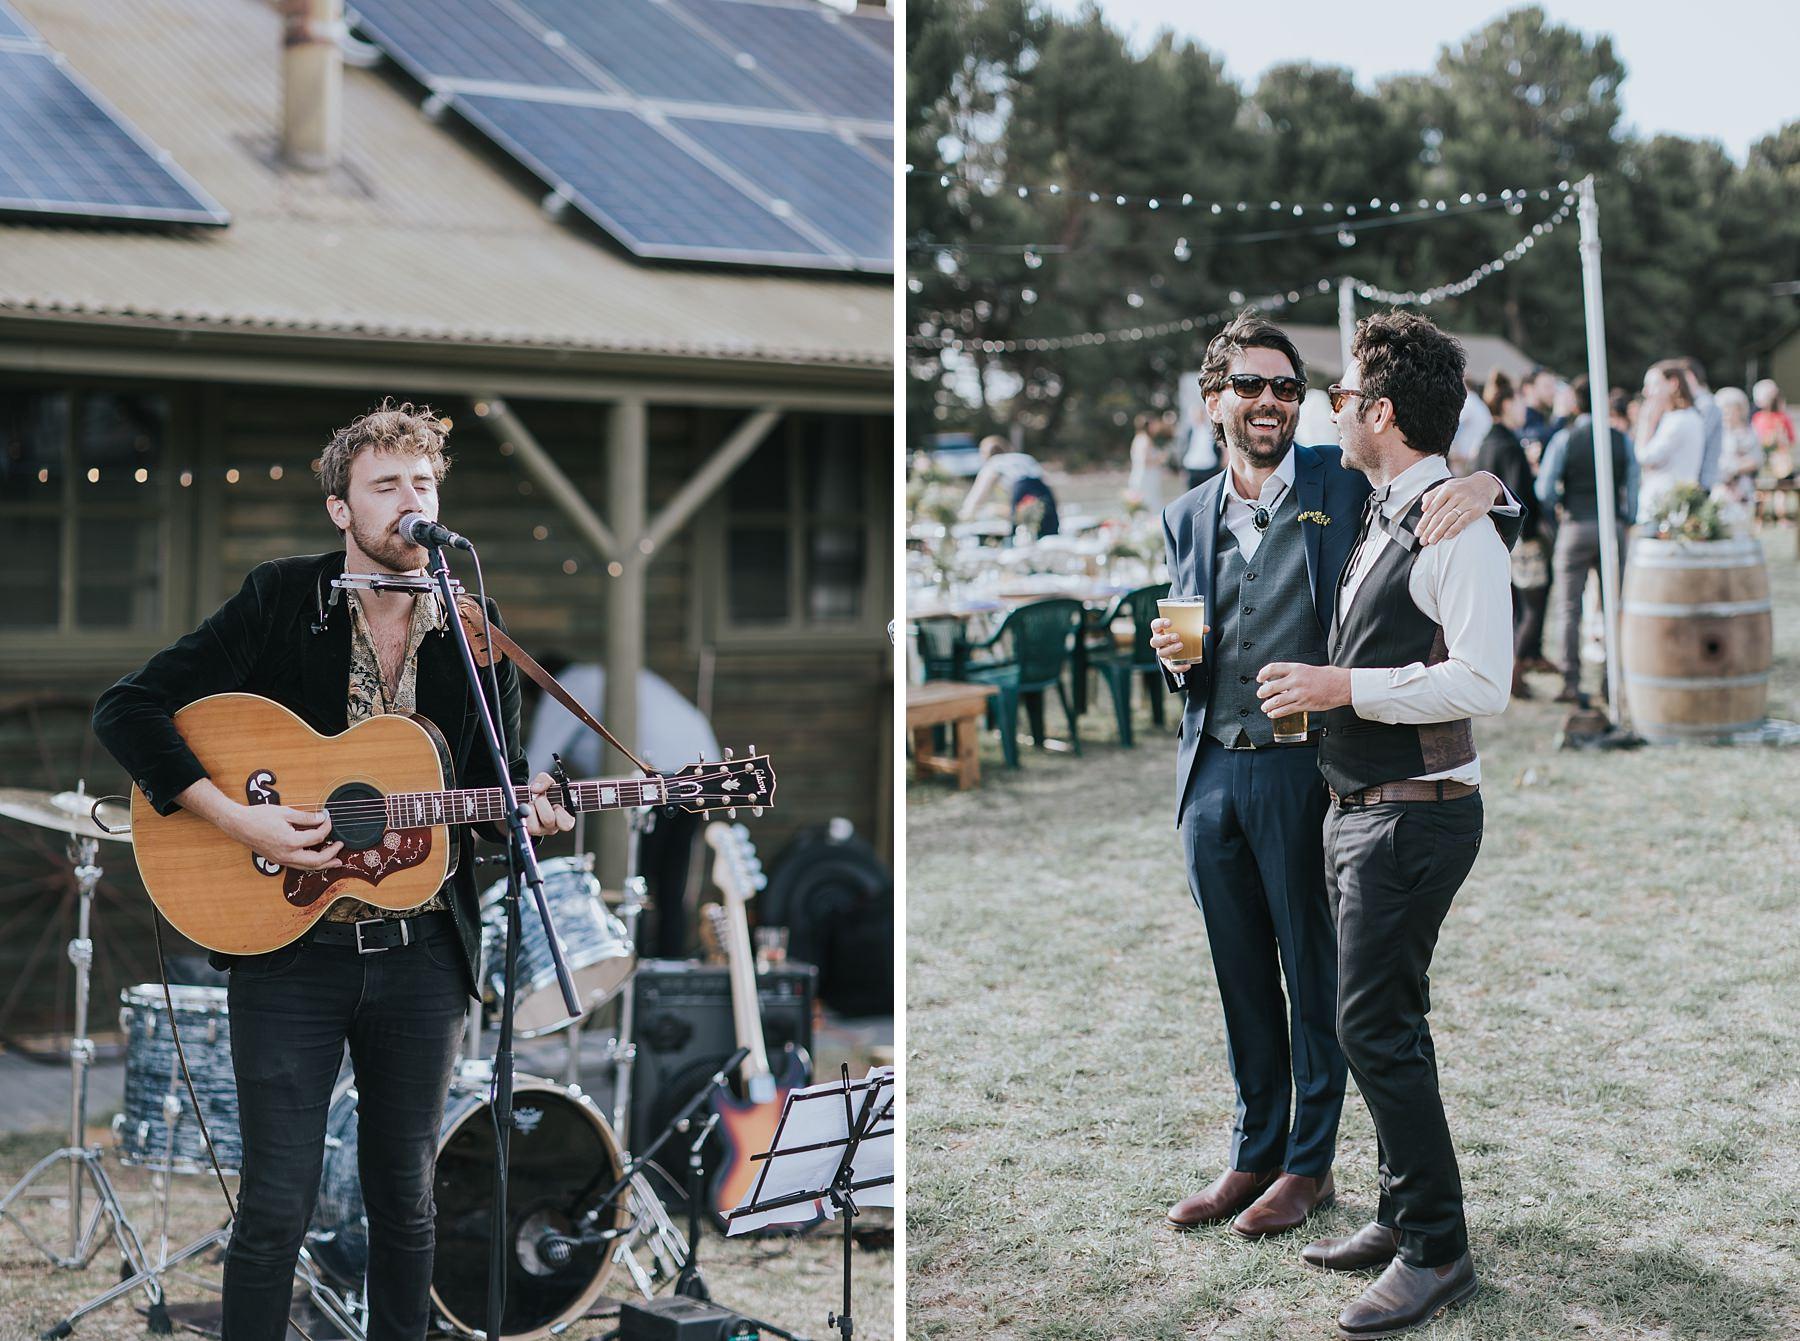 bush band playing live music at wedding reception